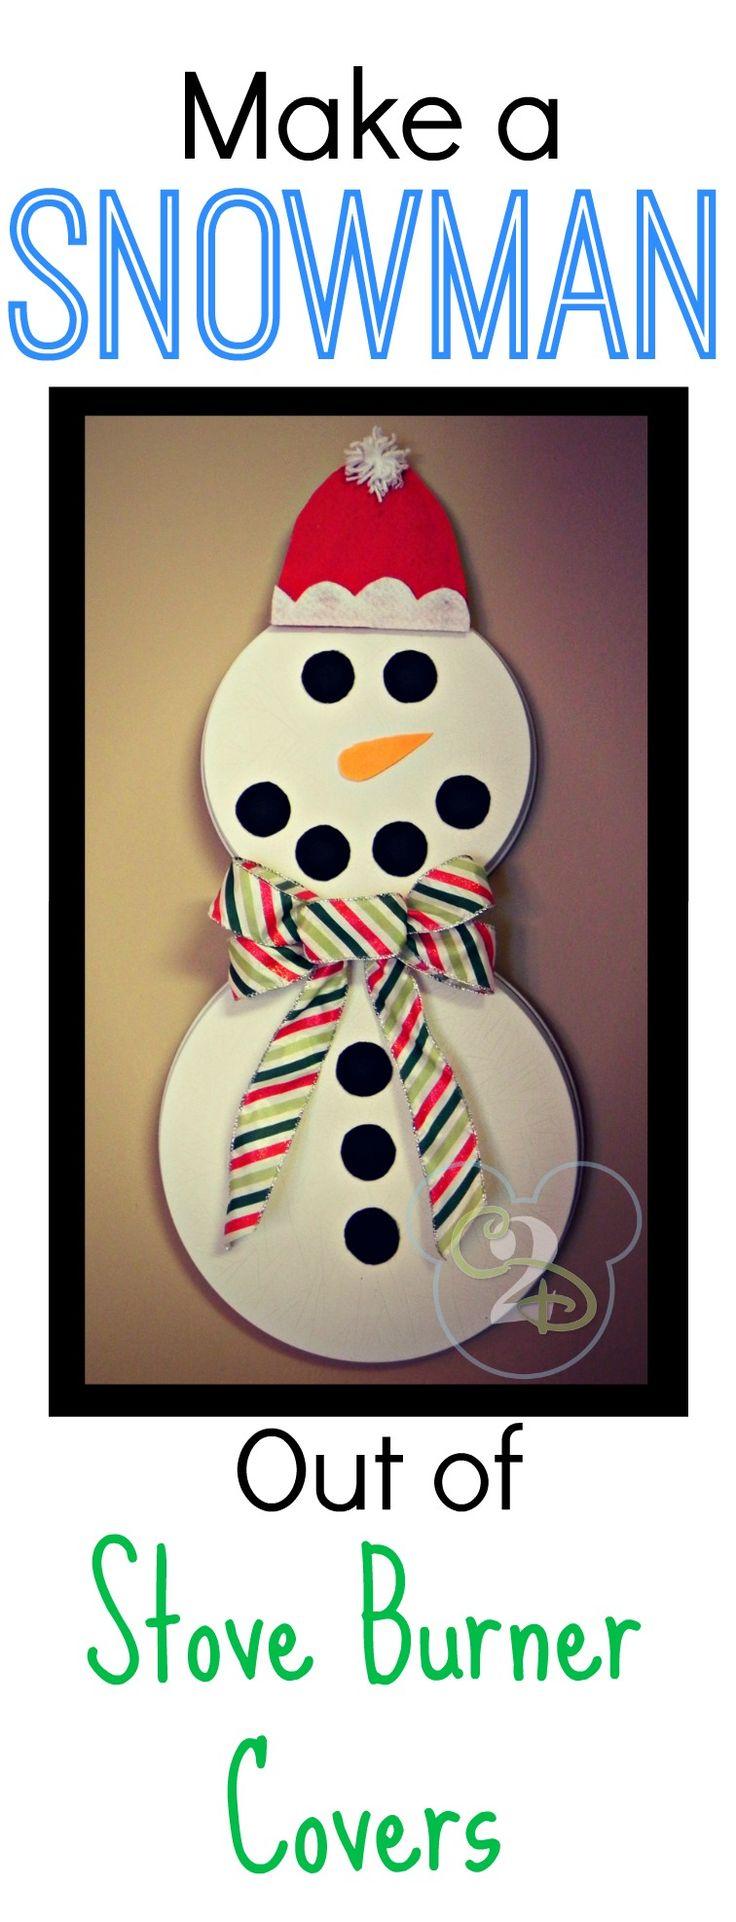 Burner Cover Snowman